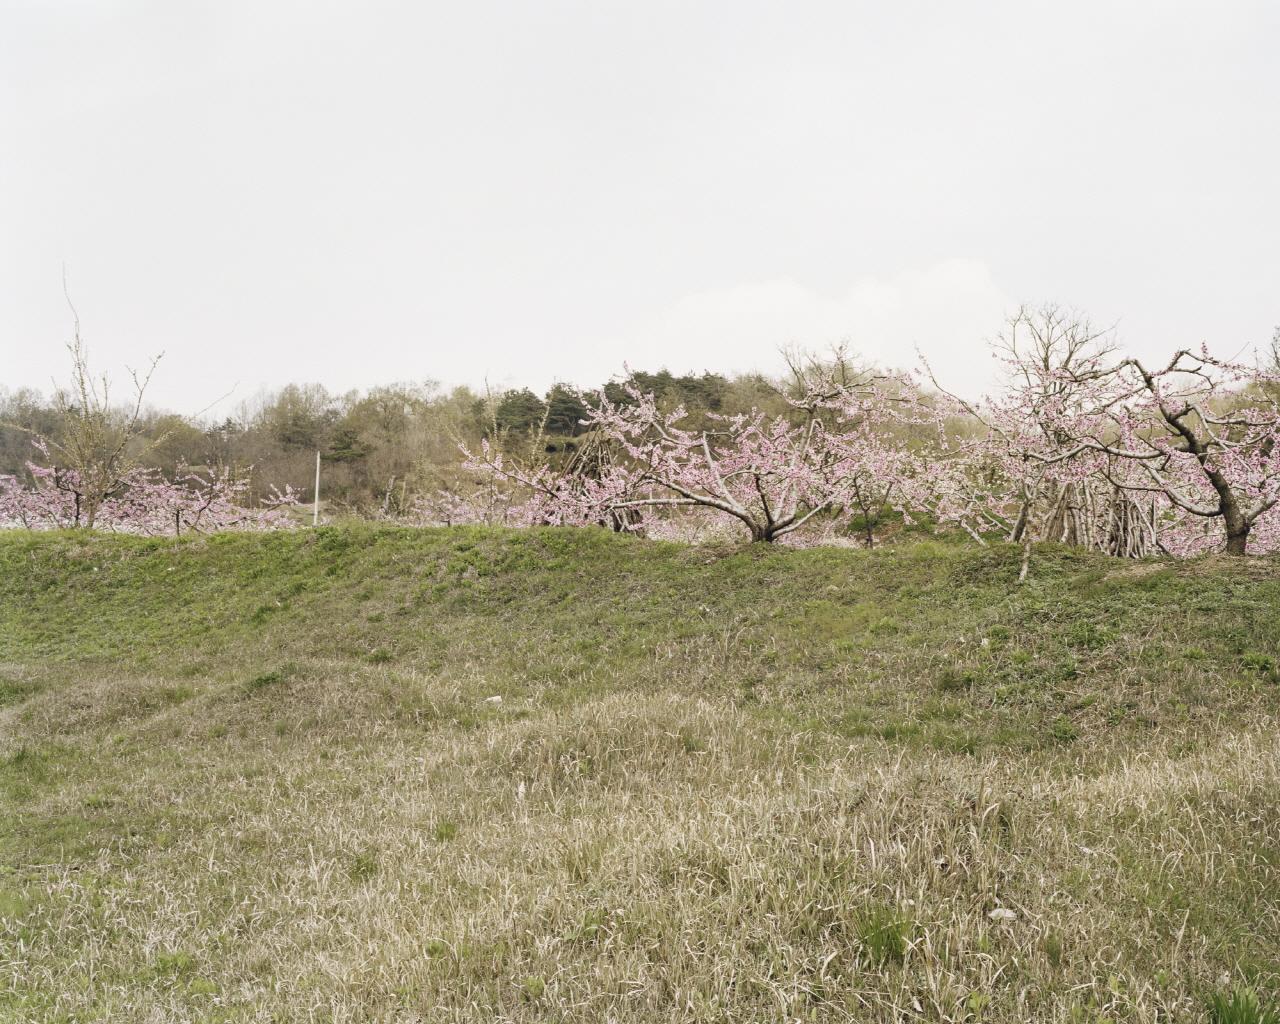 The Ground, Goesan-gun, Chungcheongbuk-do, Koera, 2006